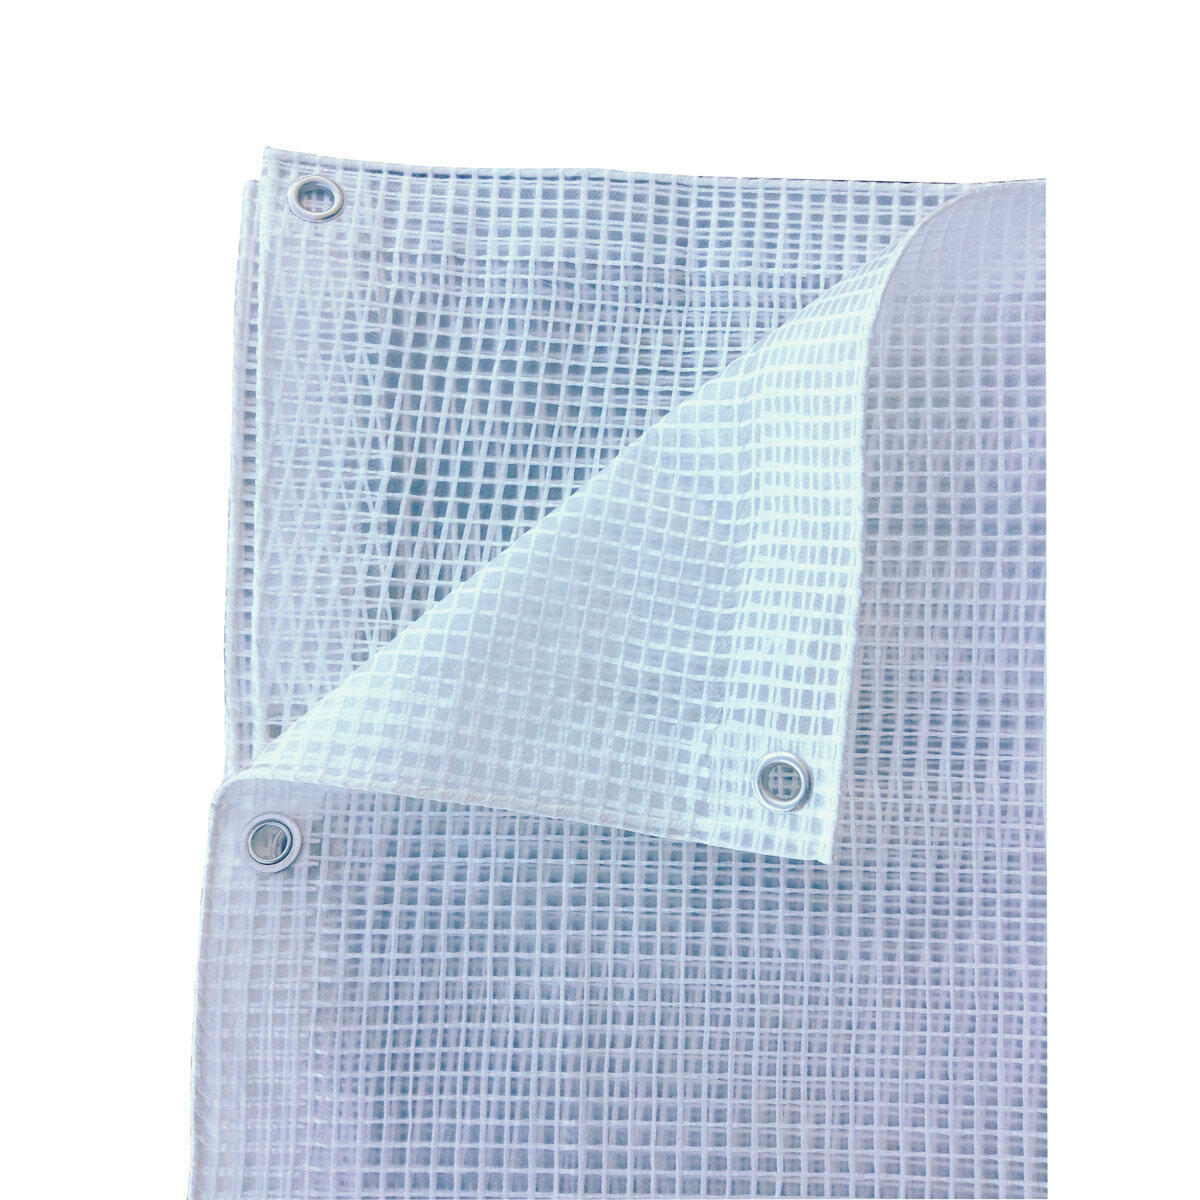 Telo per tenda da esterno trasparente 300 x 500 cm